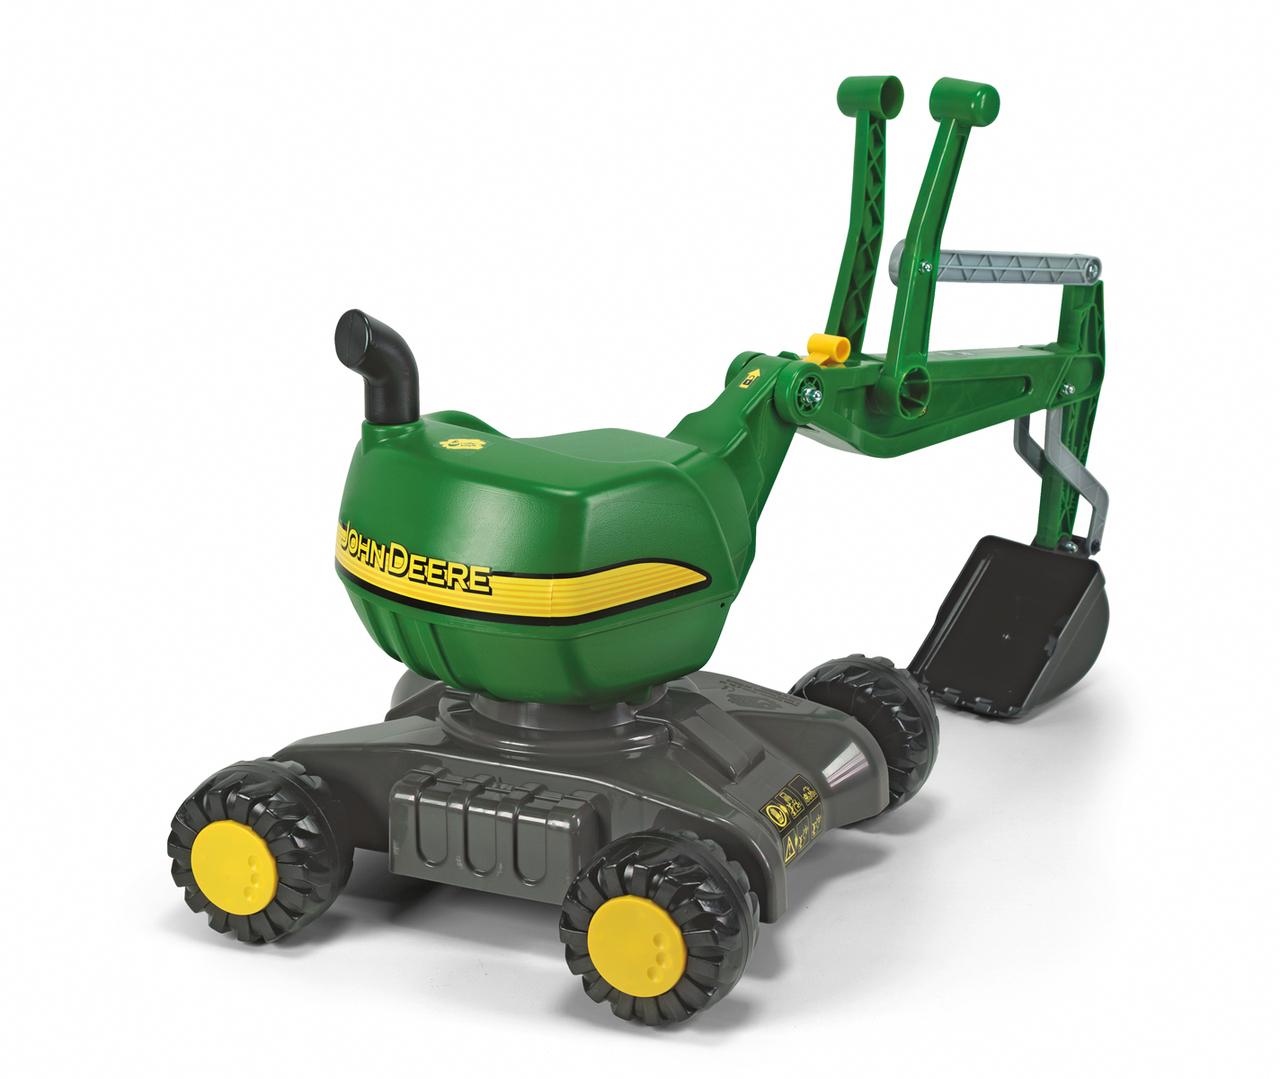 rolly-toys-jd-421022-2-68343.1518313071.1280.1280.jpg